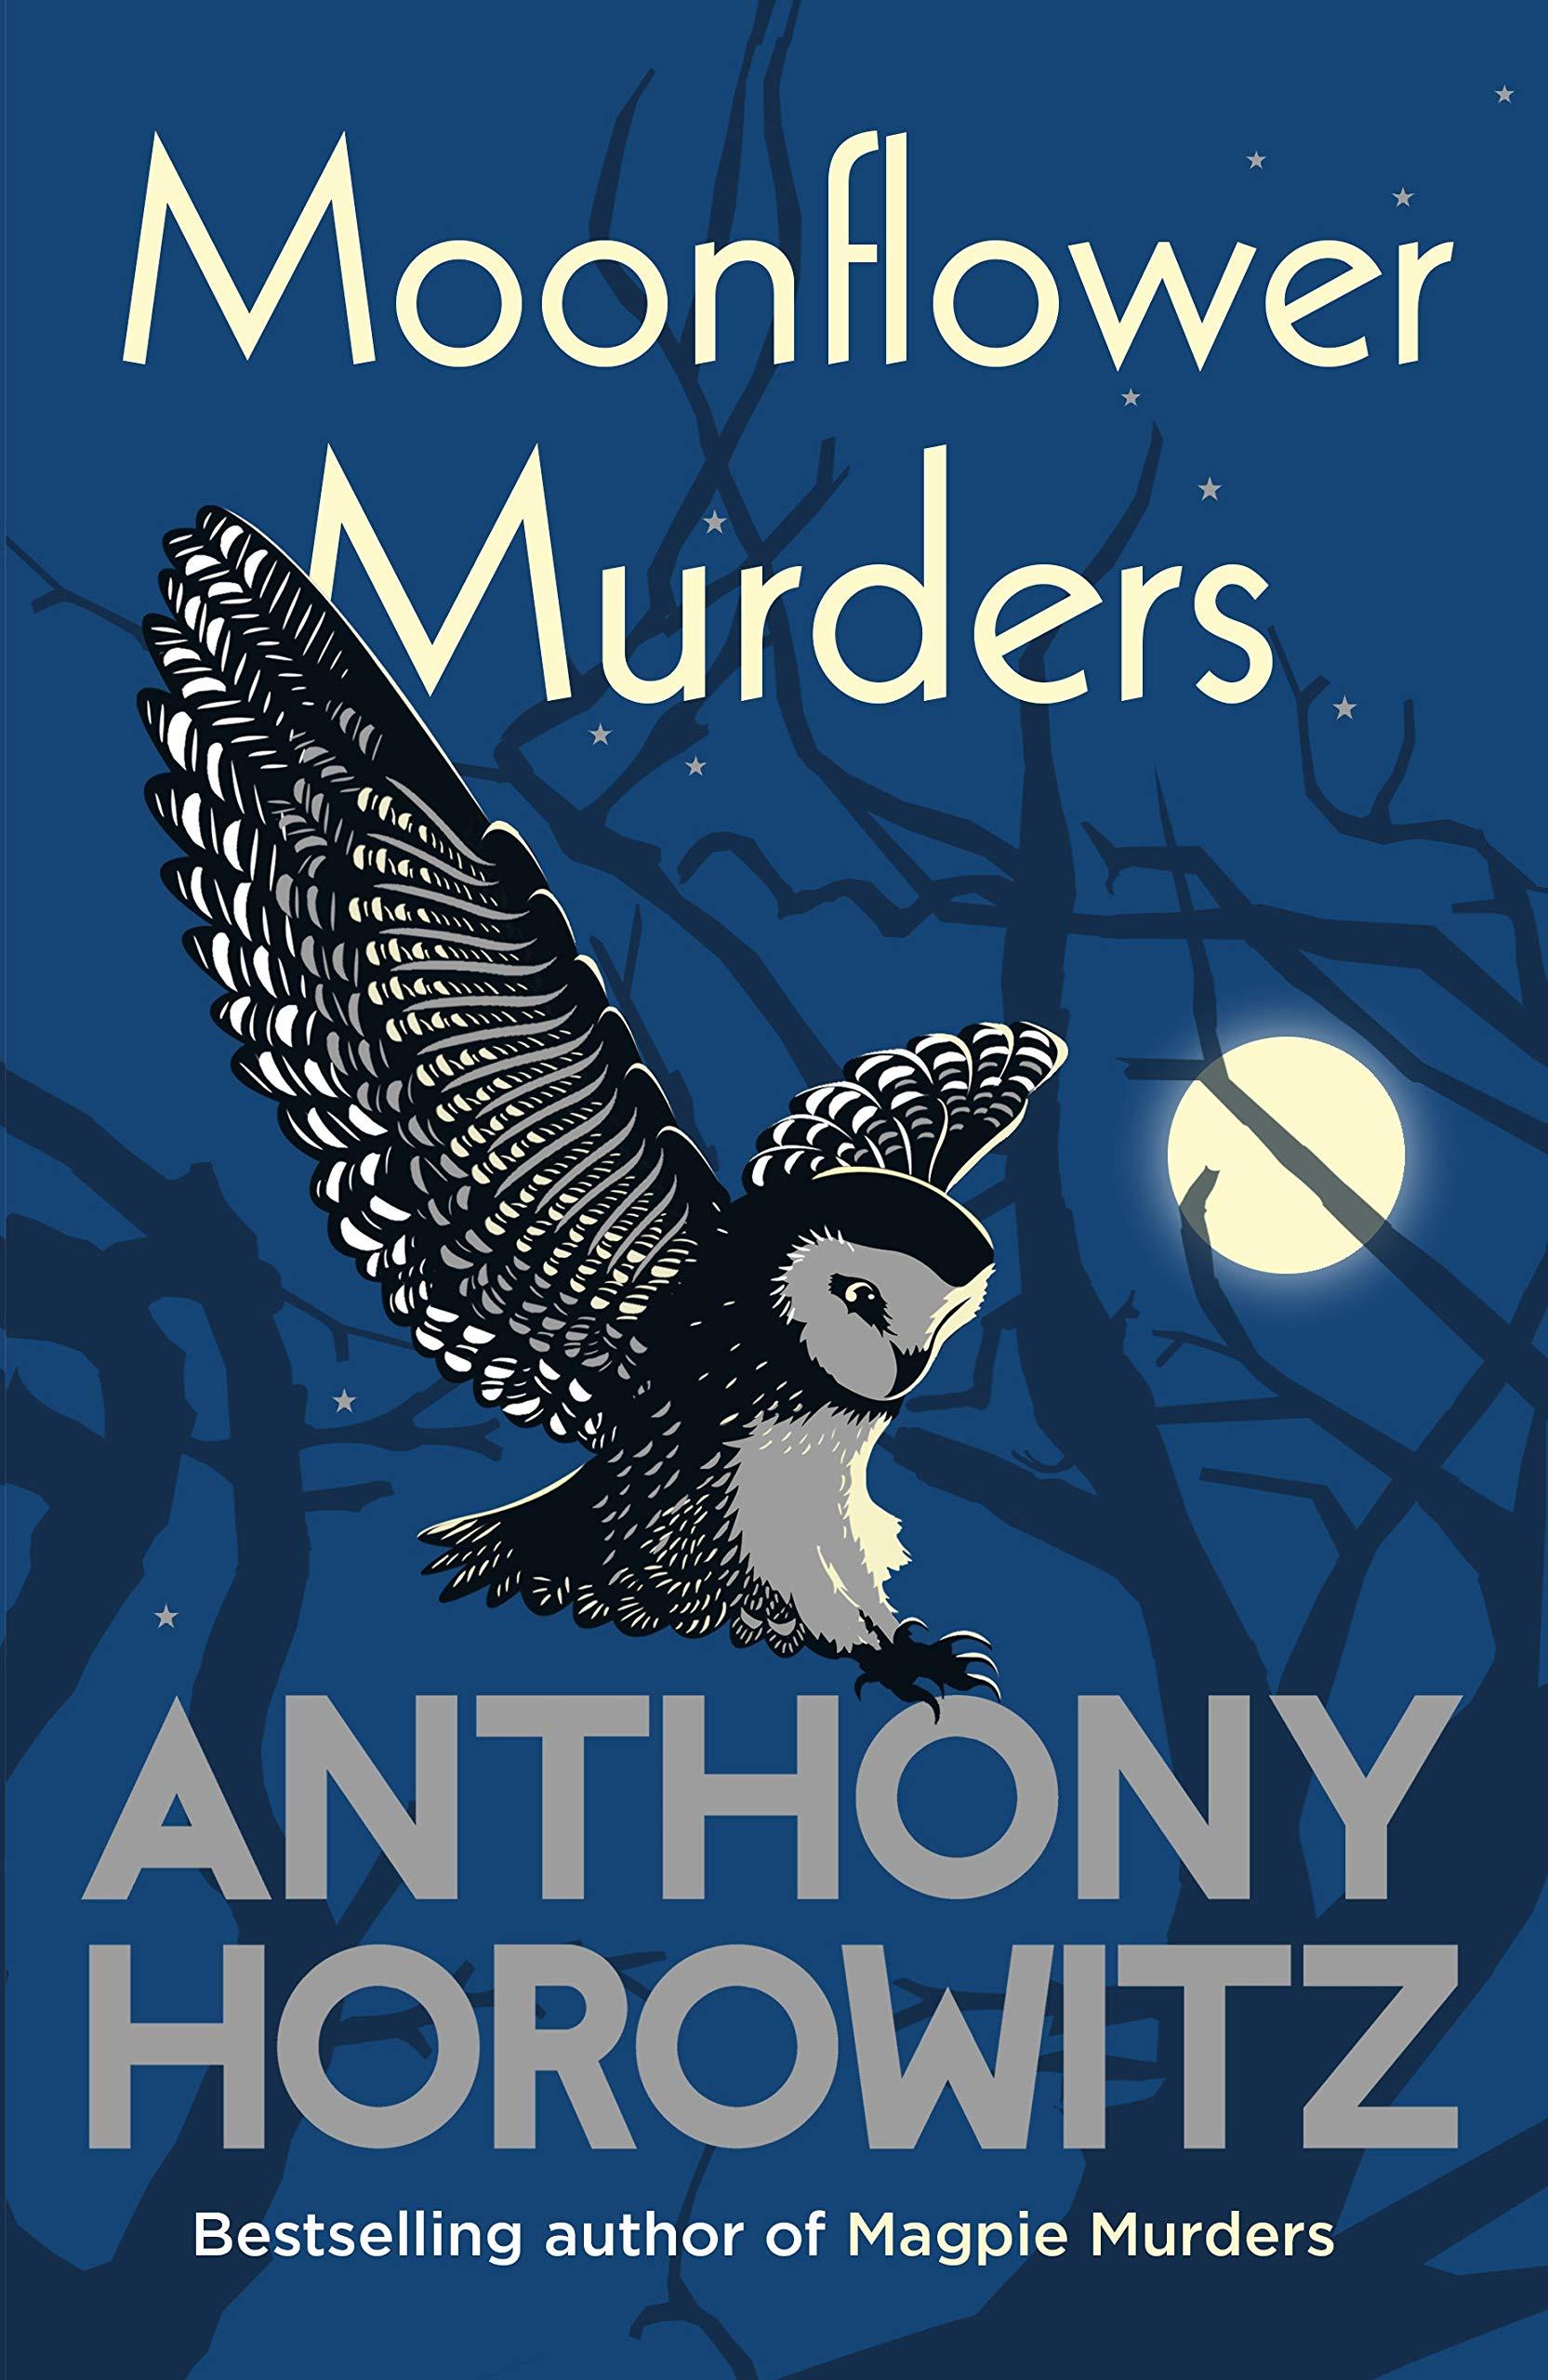 Moonflower Murders | Anthony Horowitz | Charlie Byrne's